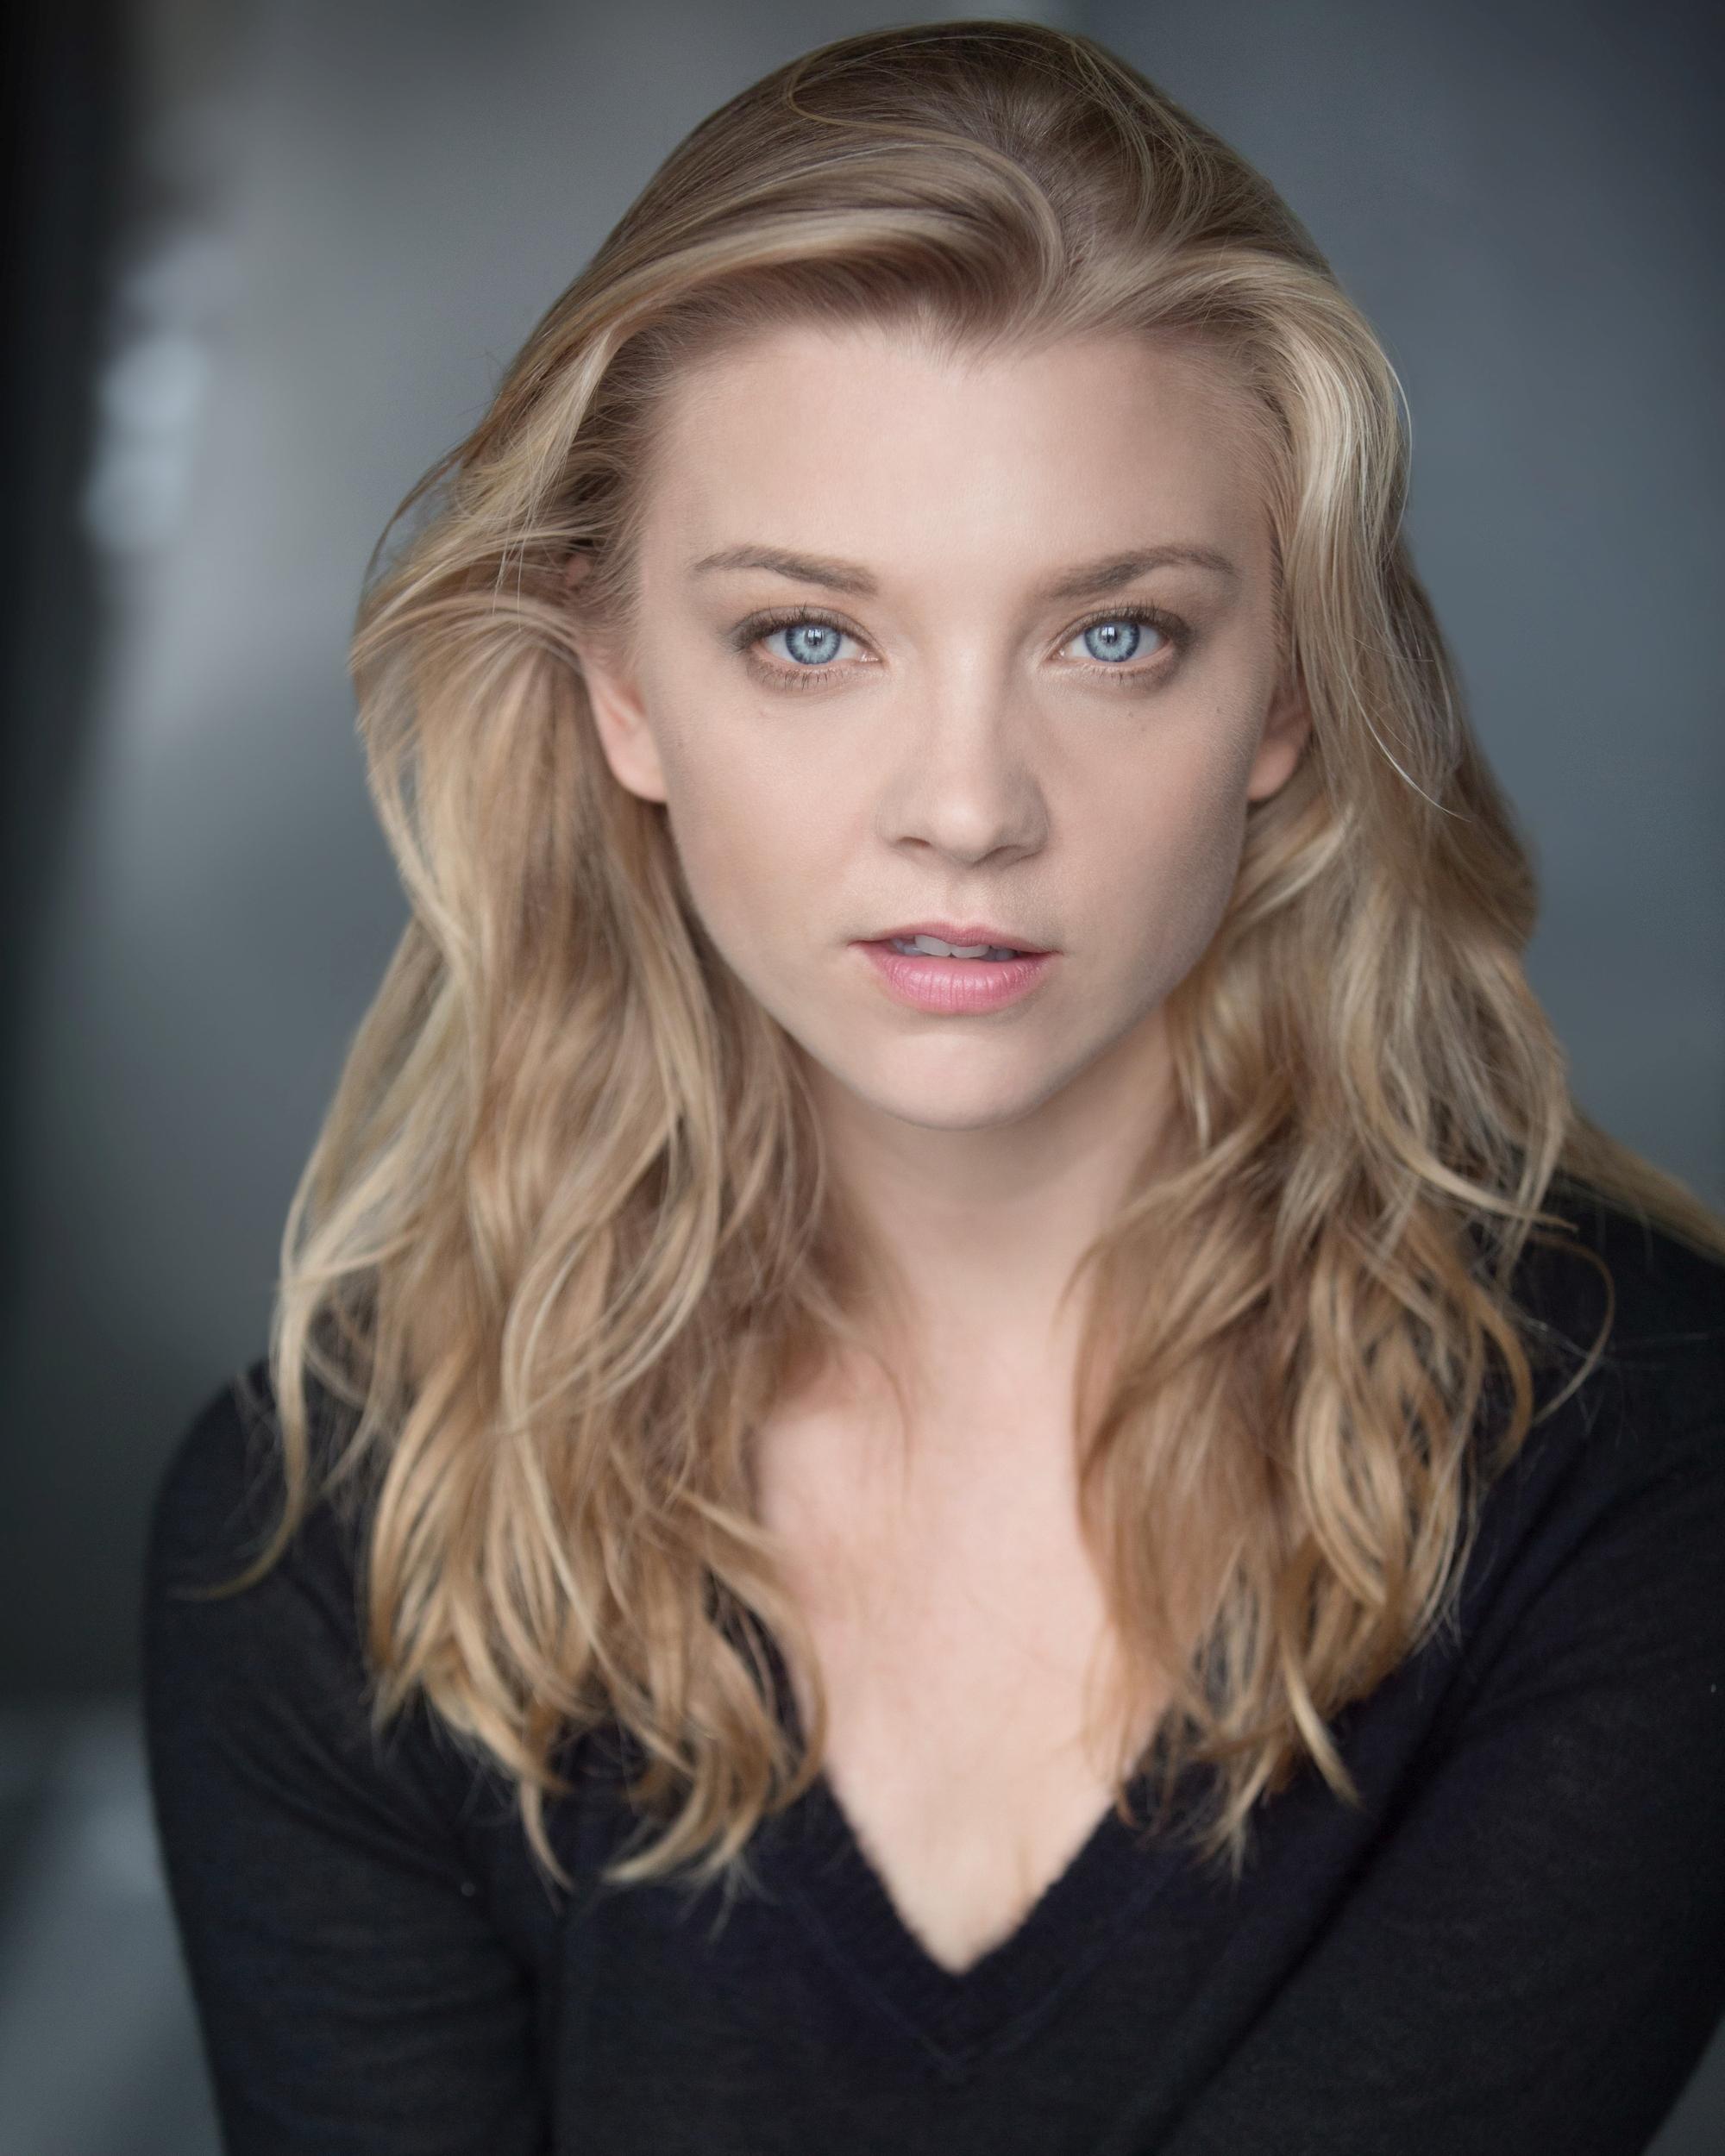 People 2000x2500 Natalie Dormer  face actress women blue eyes blonde long hair depth of field